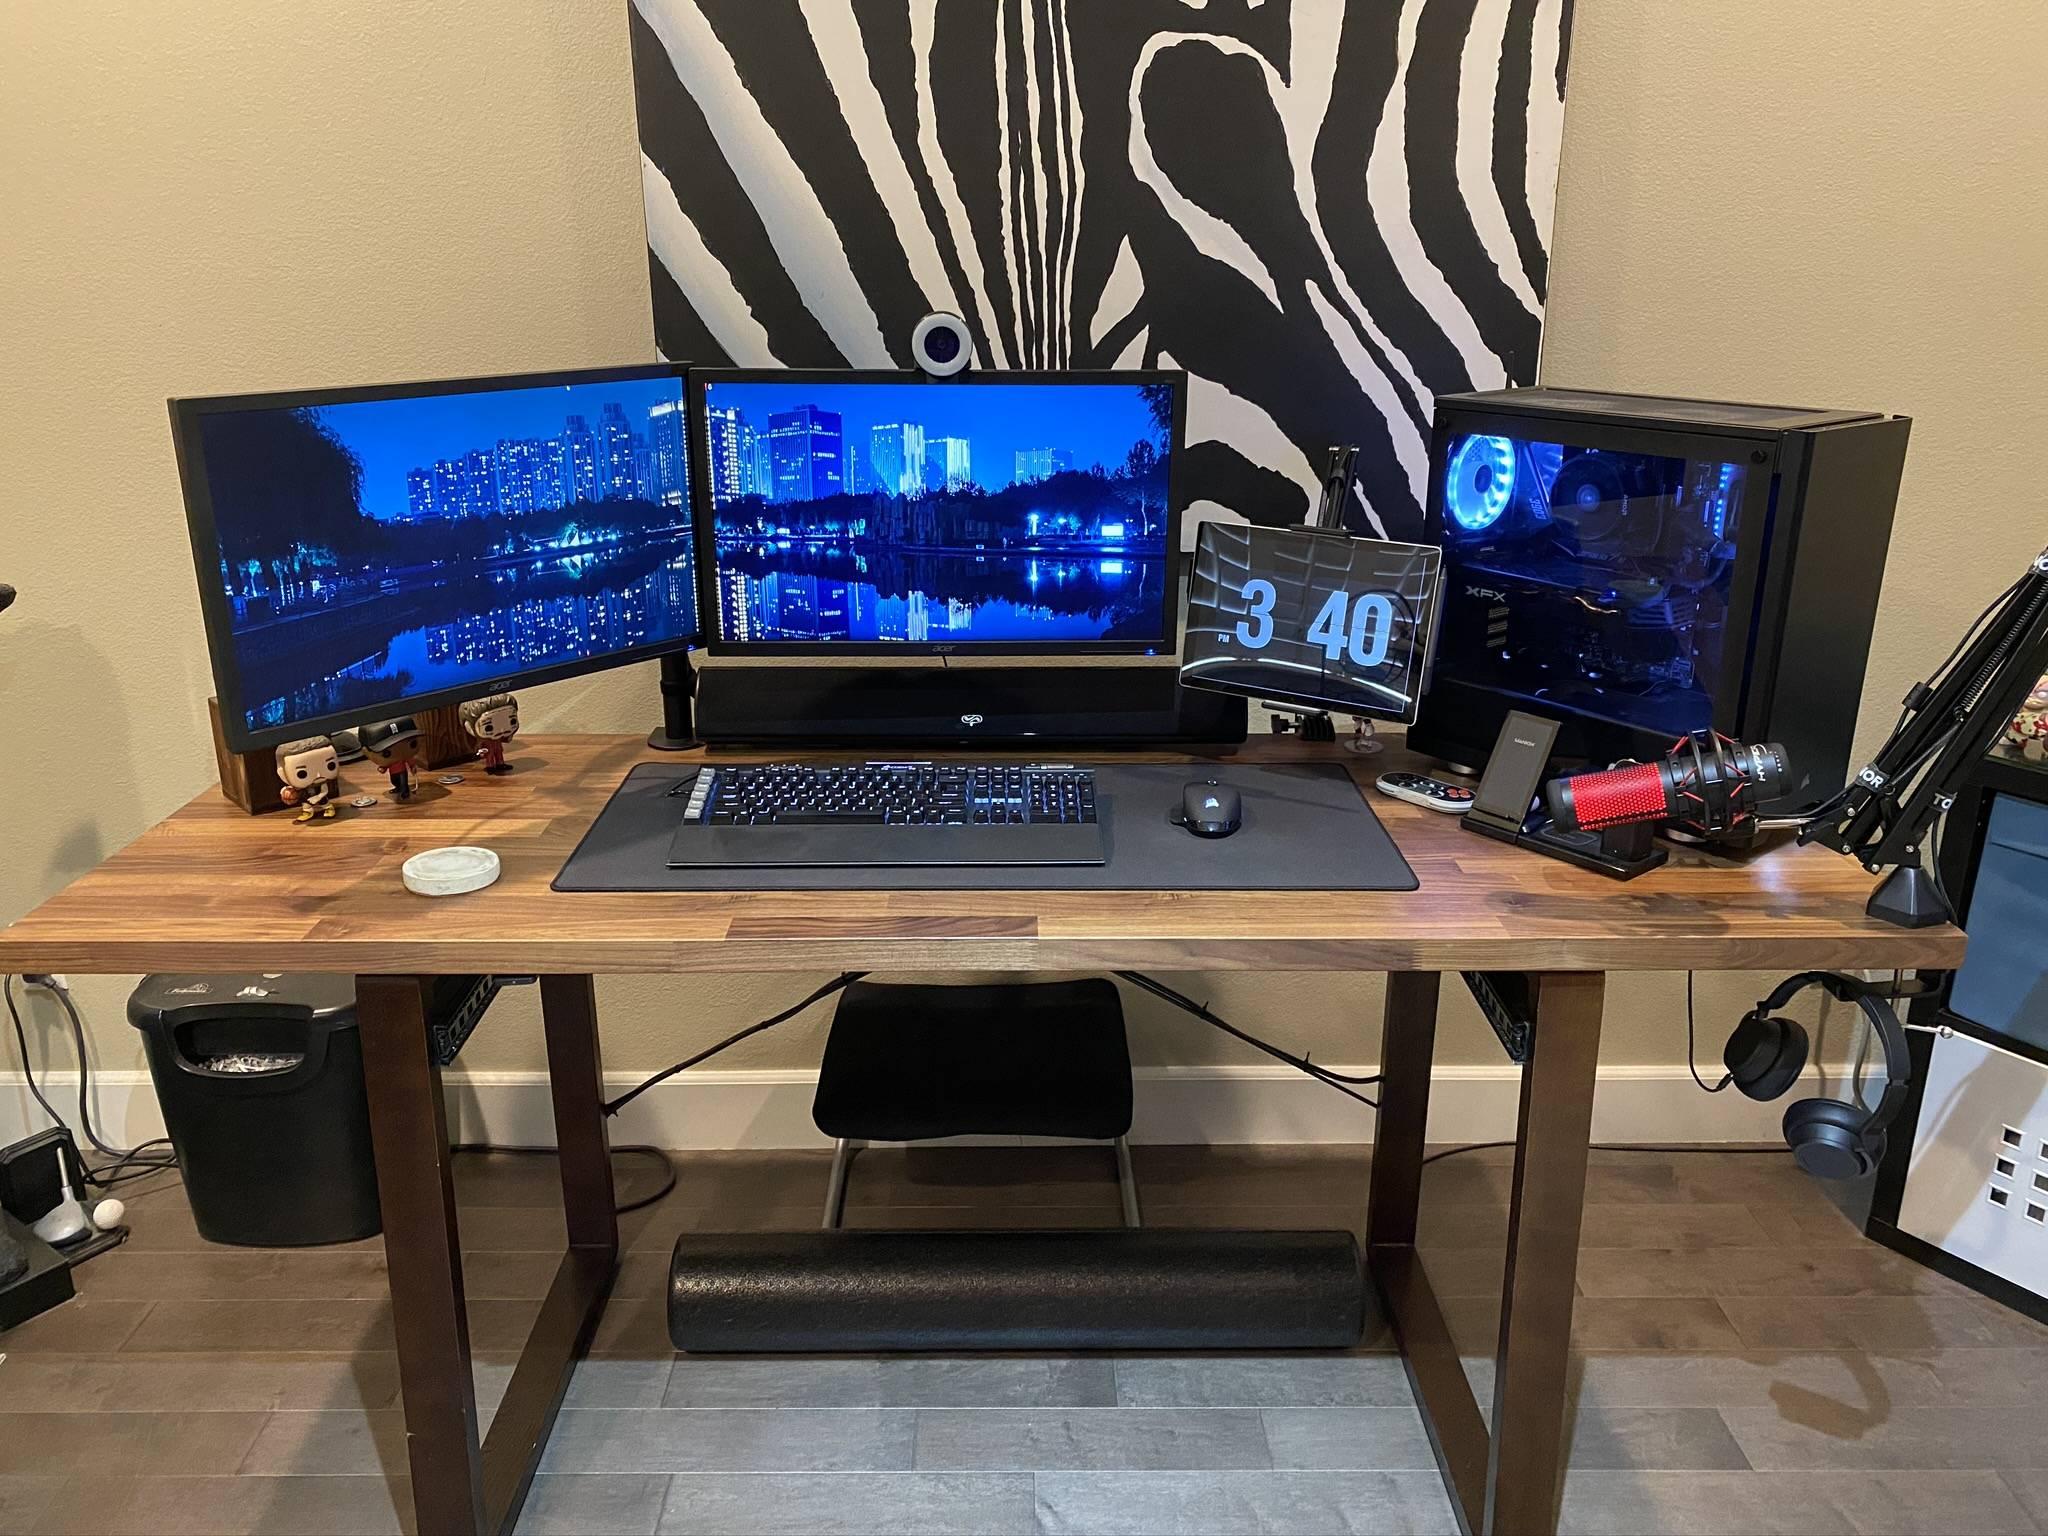 mikisslick's Setup - WFH / Gaming / Chill Setup Ver. 2 | Scooget